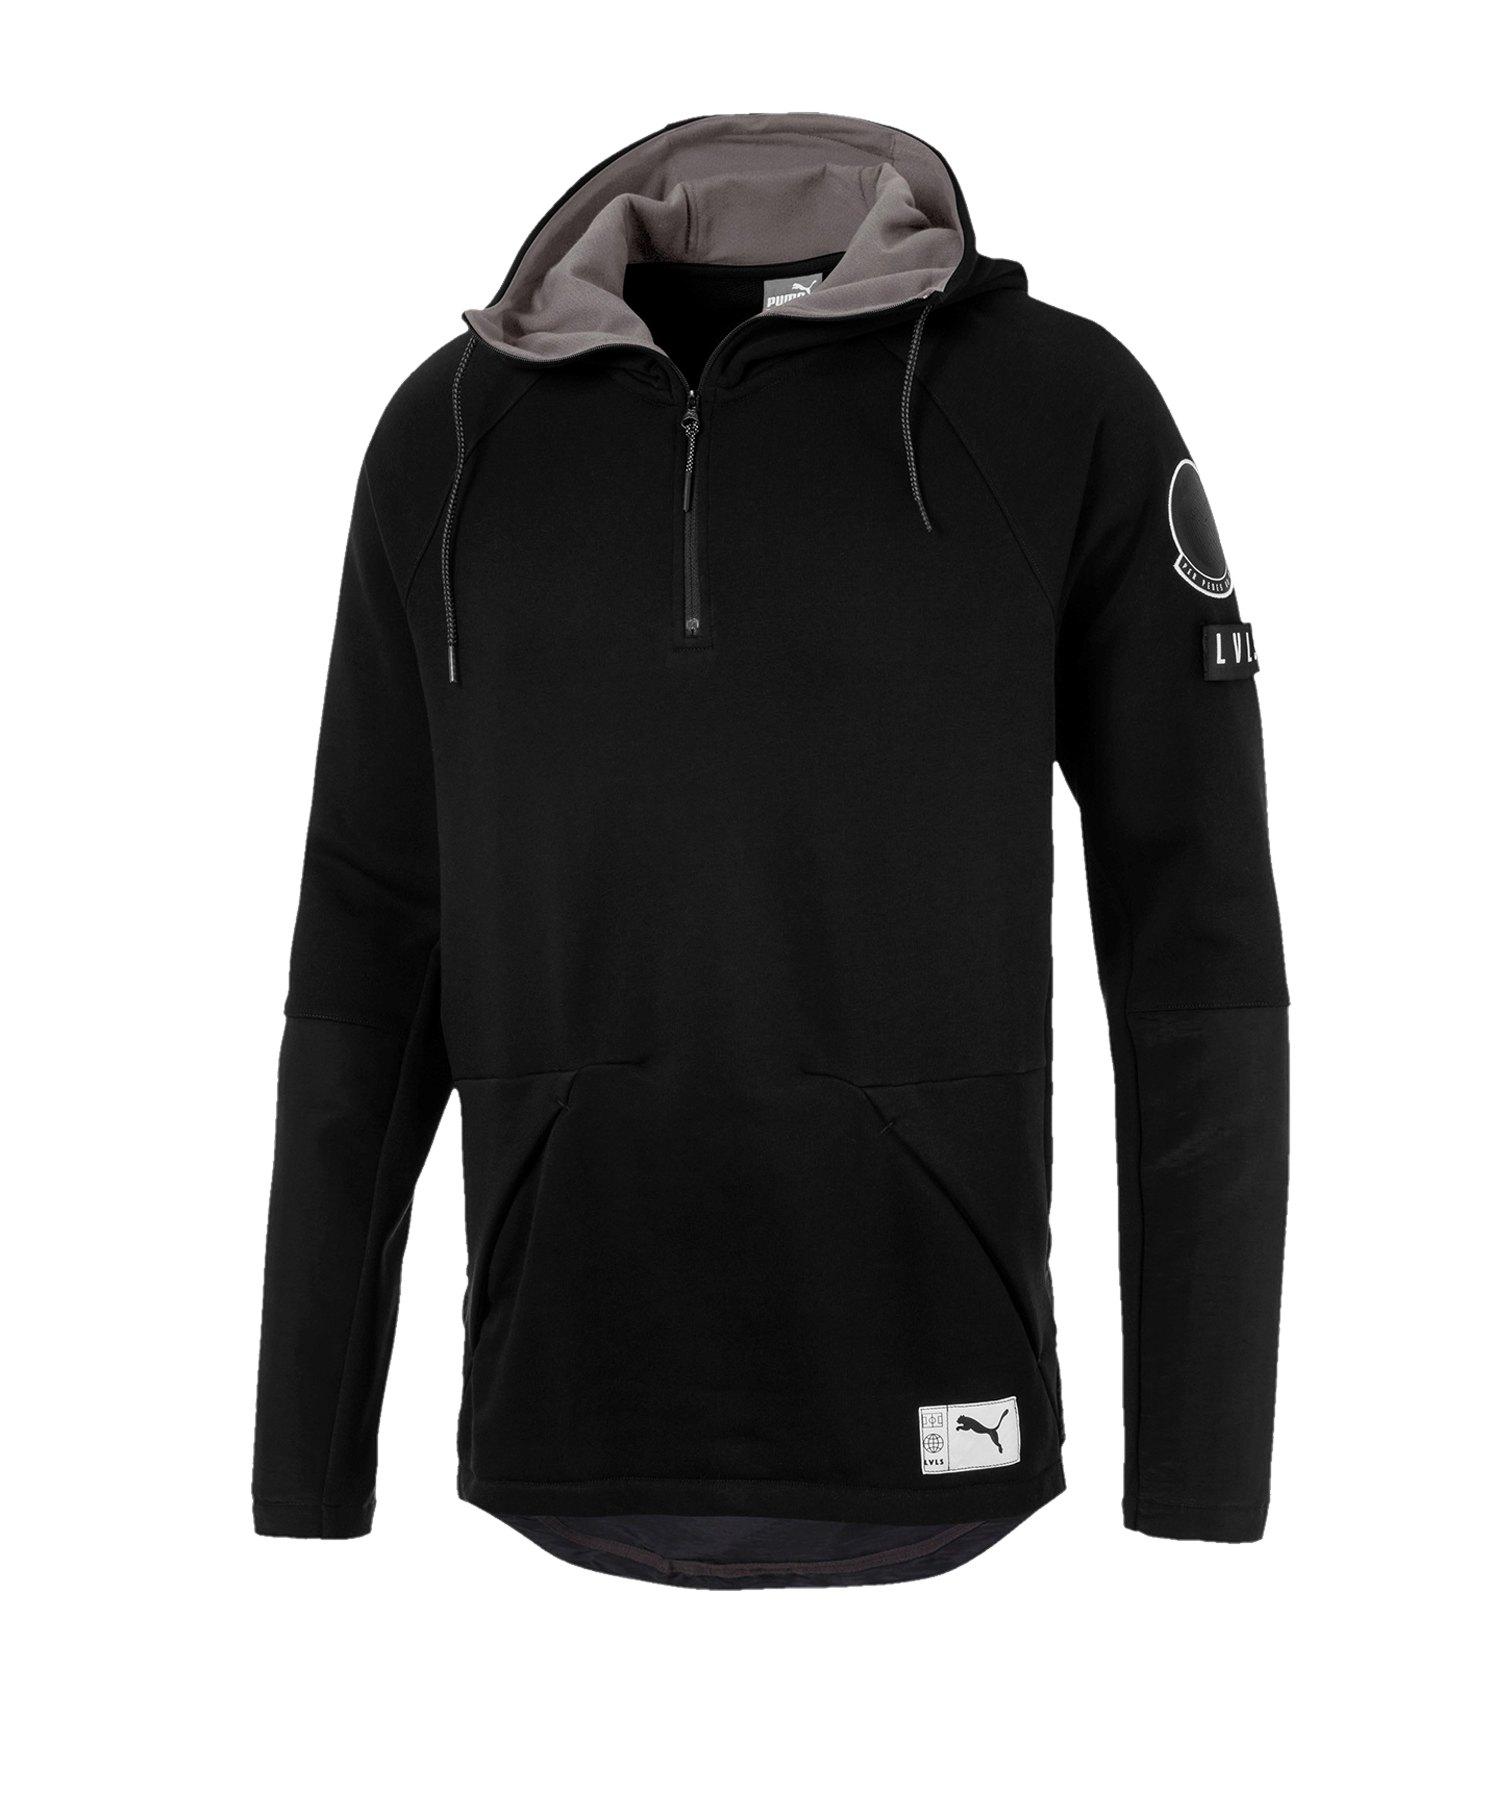 PUMA ftblNXT Casuals Zip-Hoody Schwarz Grau F01 - schwarz